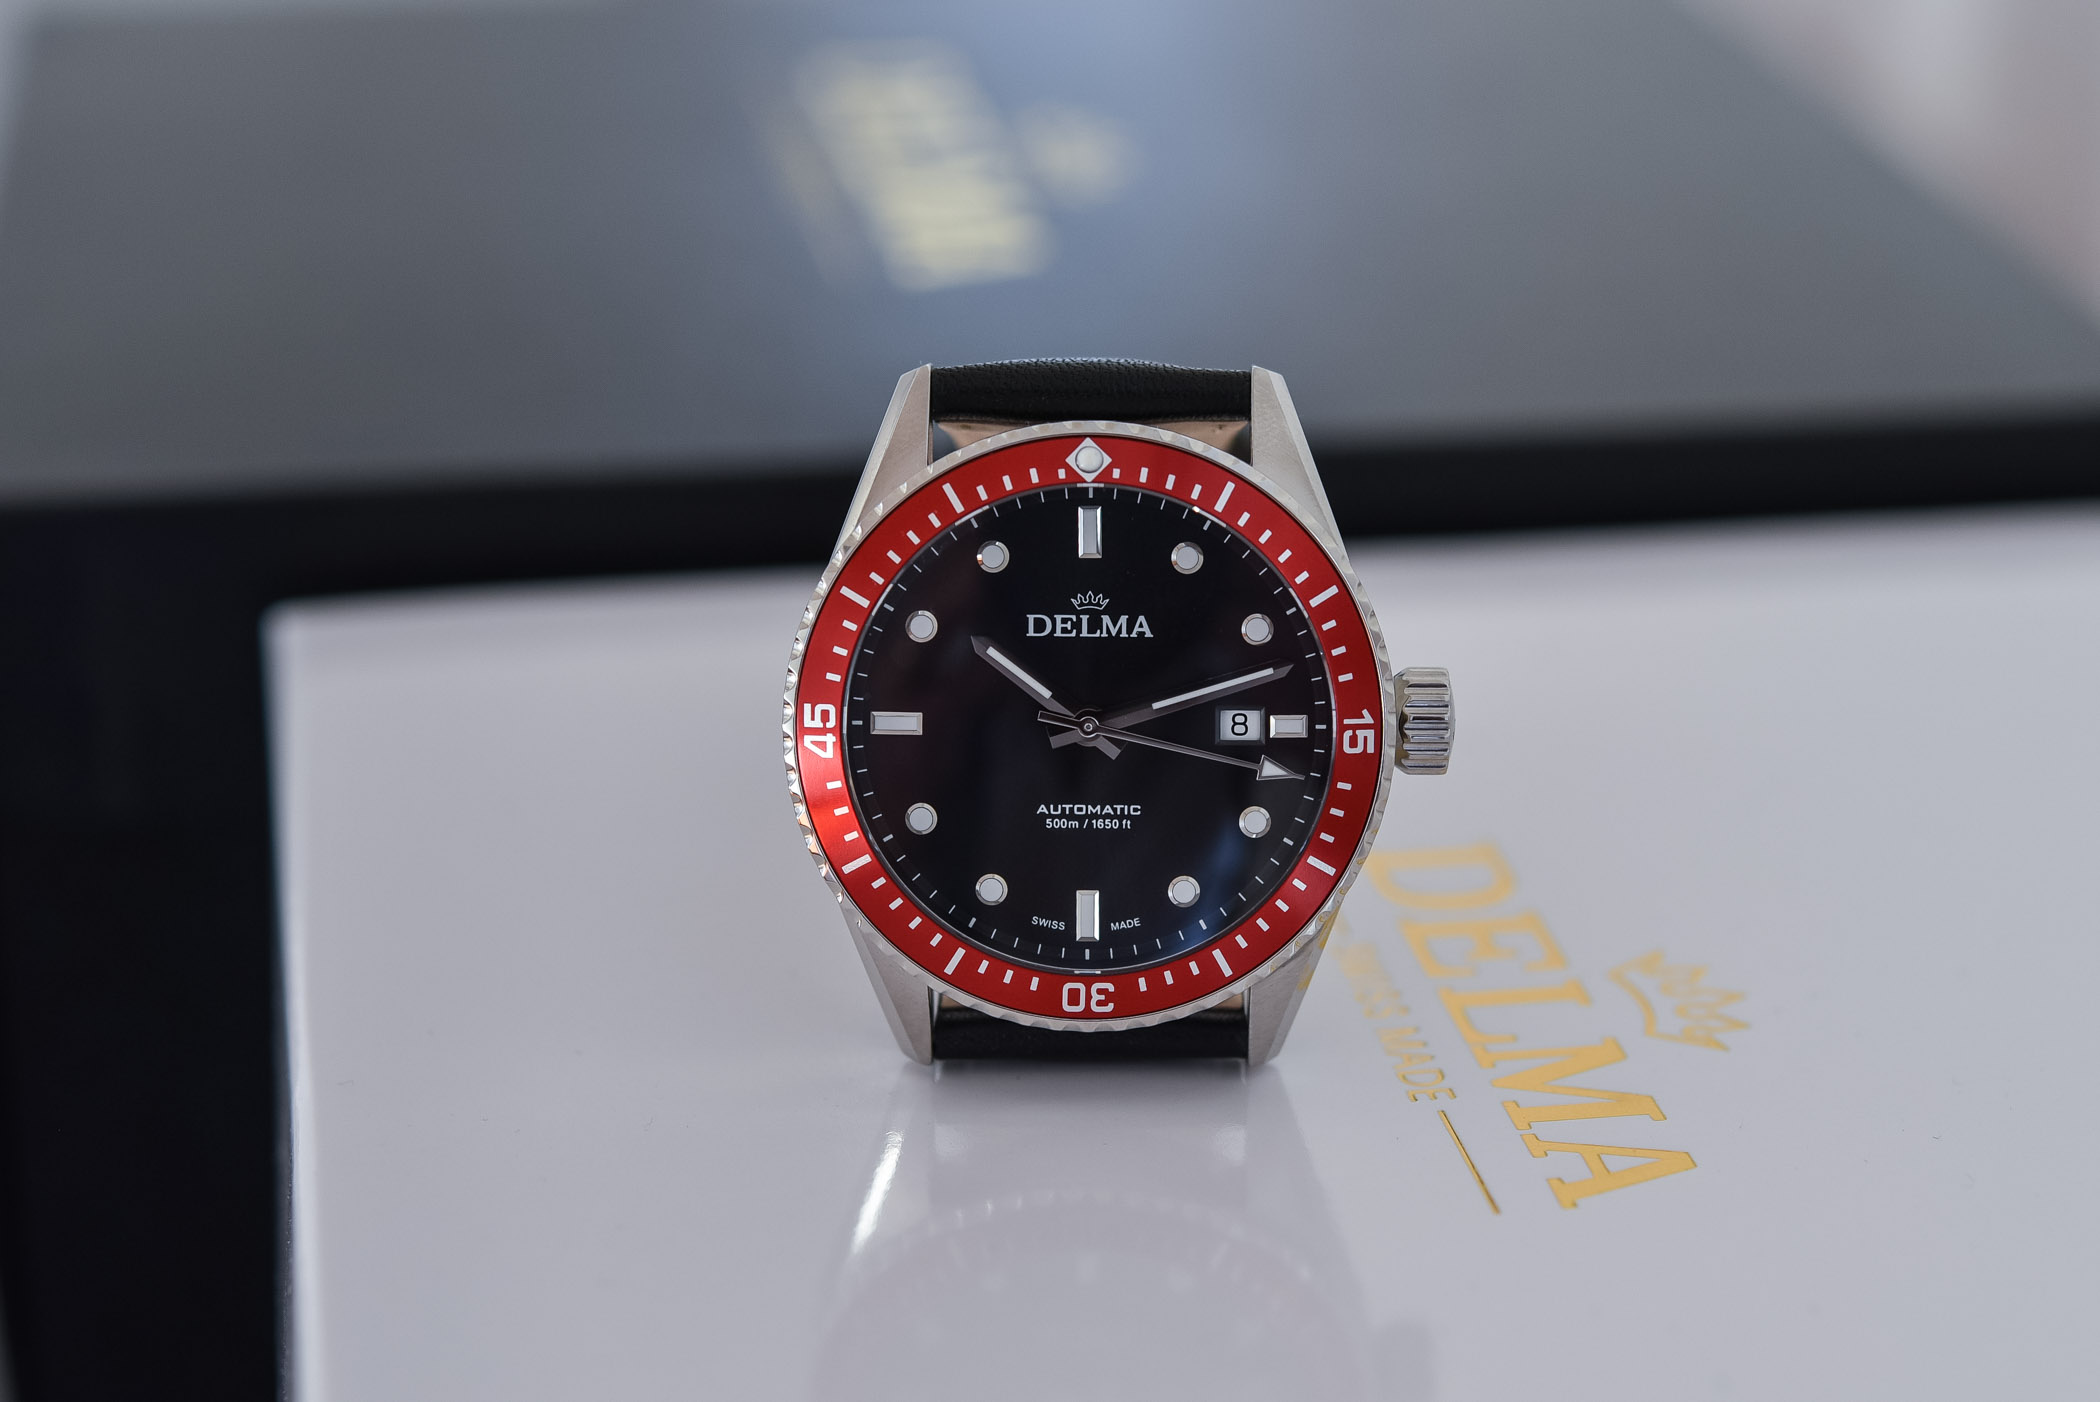 Delma Cayman Automatic Dive Watch - Value Proposition